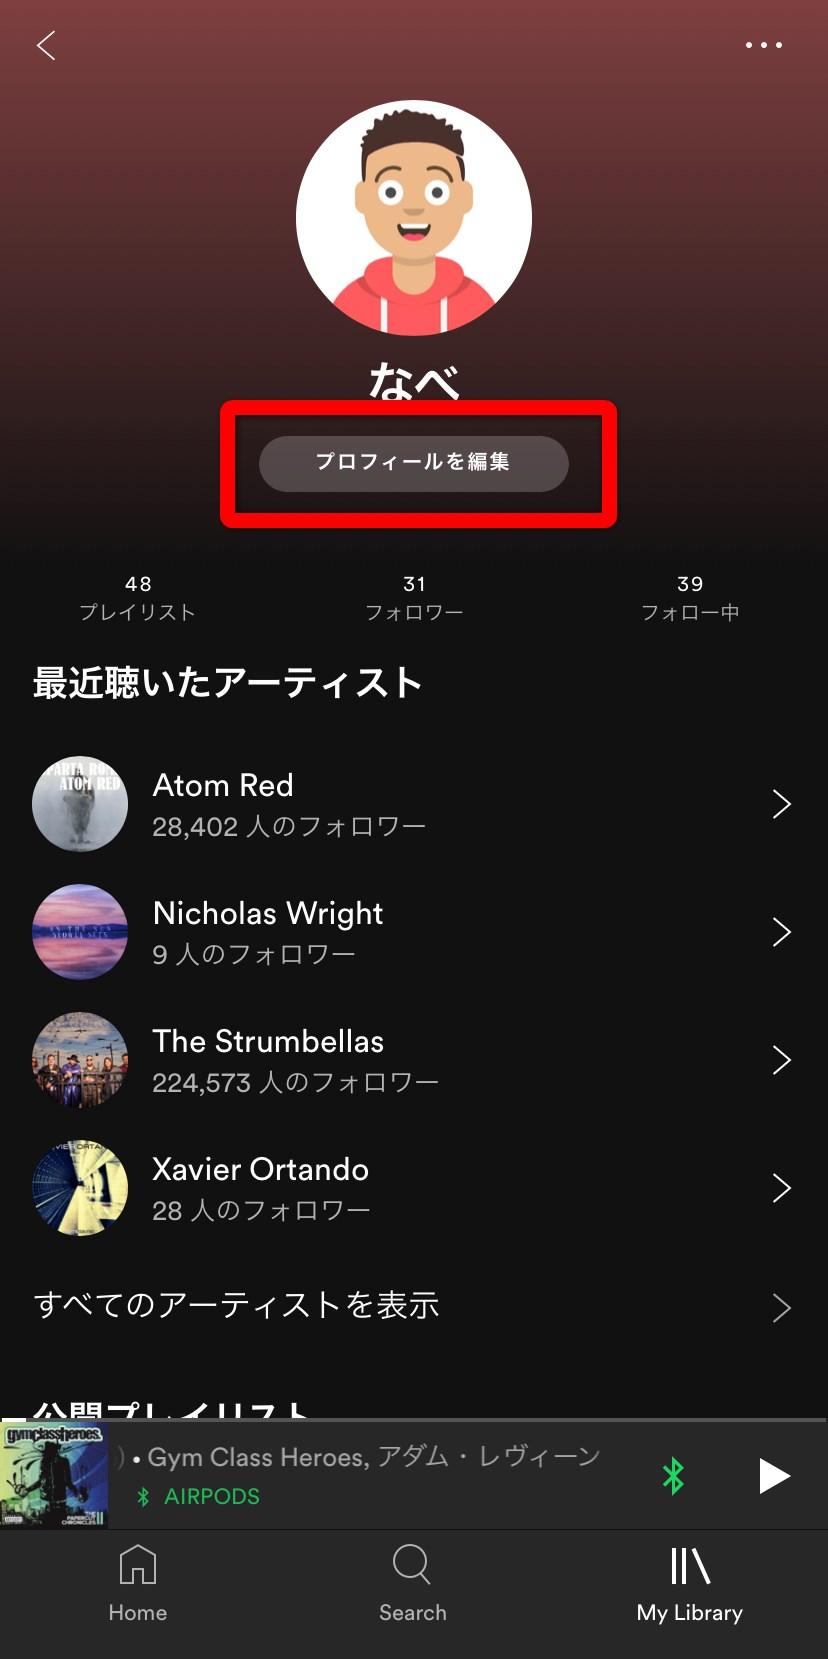 Spotifyのニックネームを確認する&変更する方法